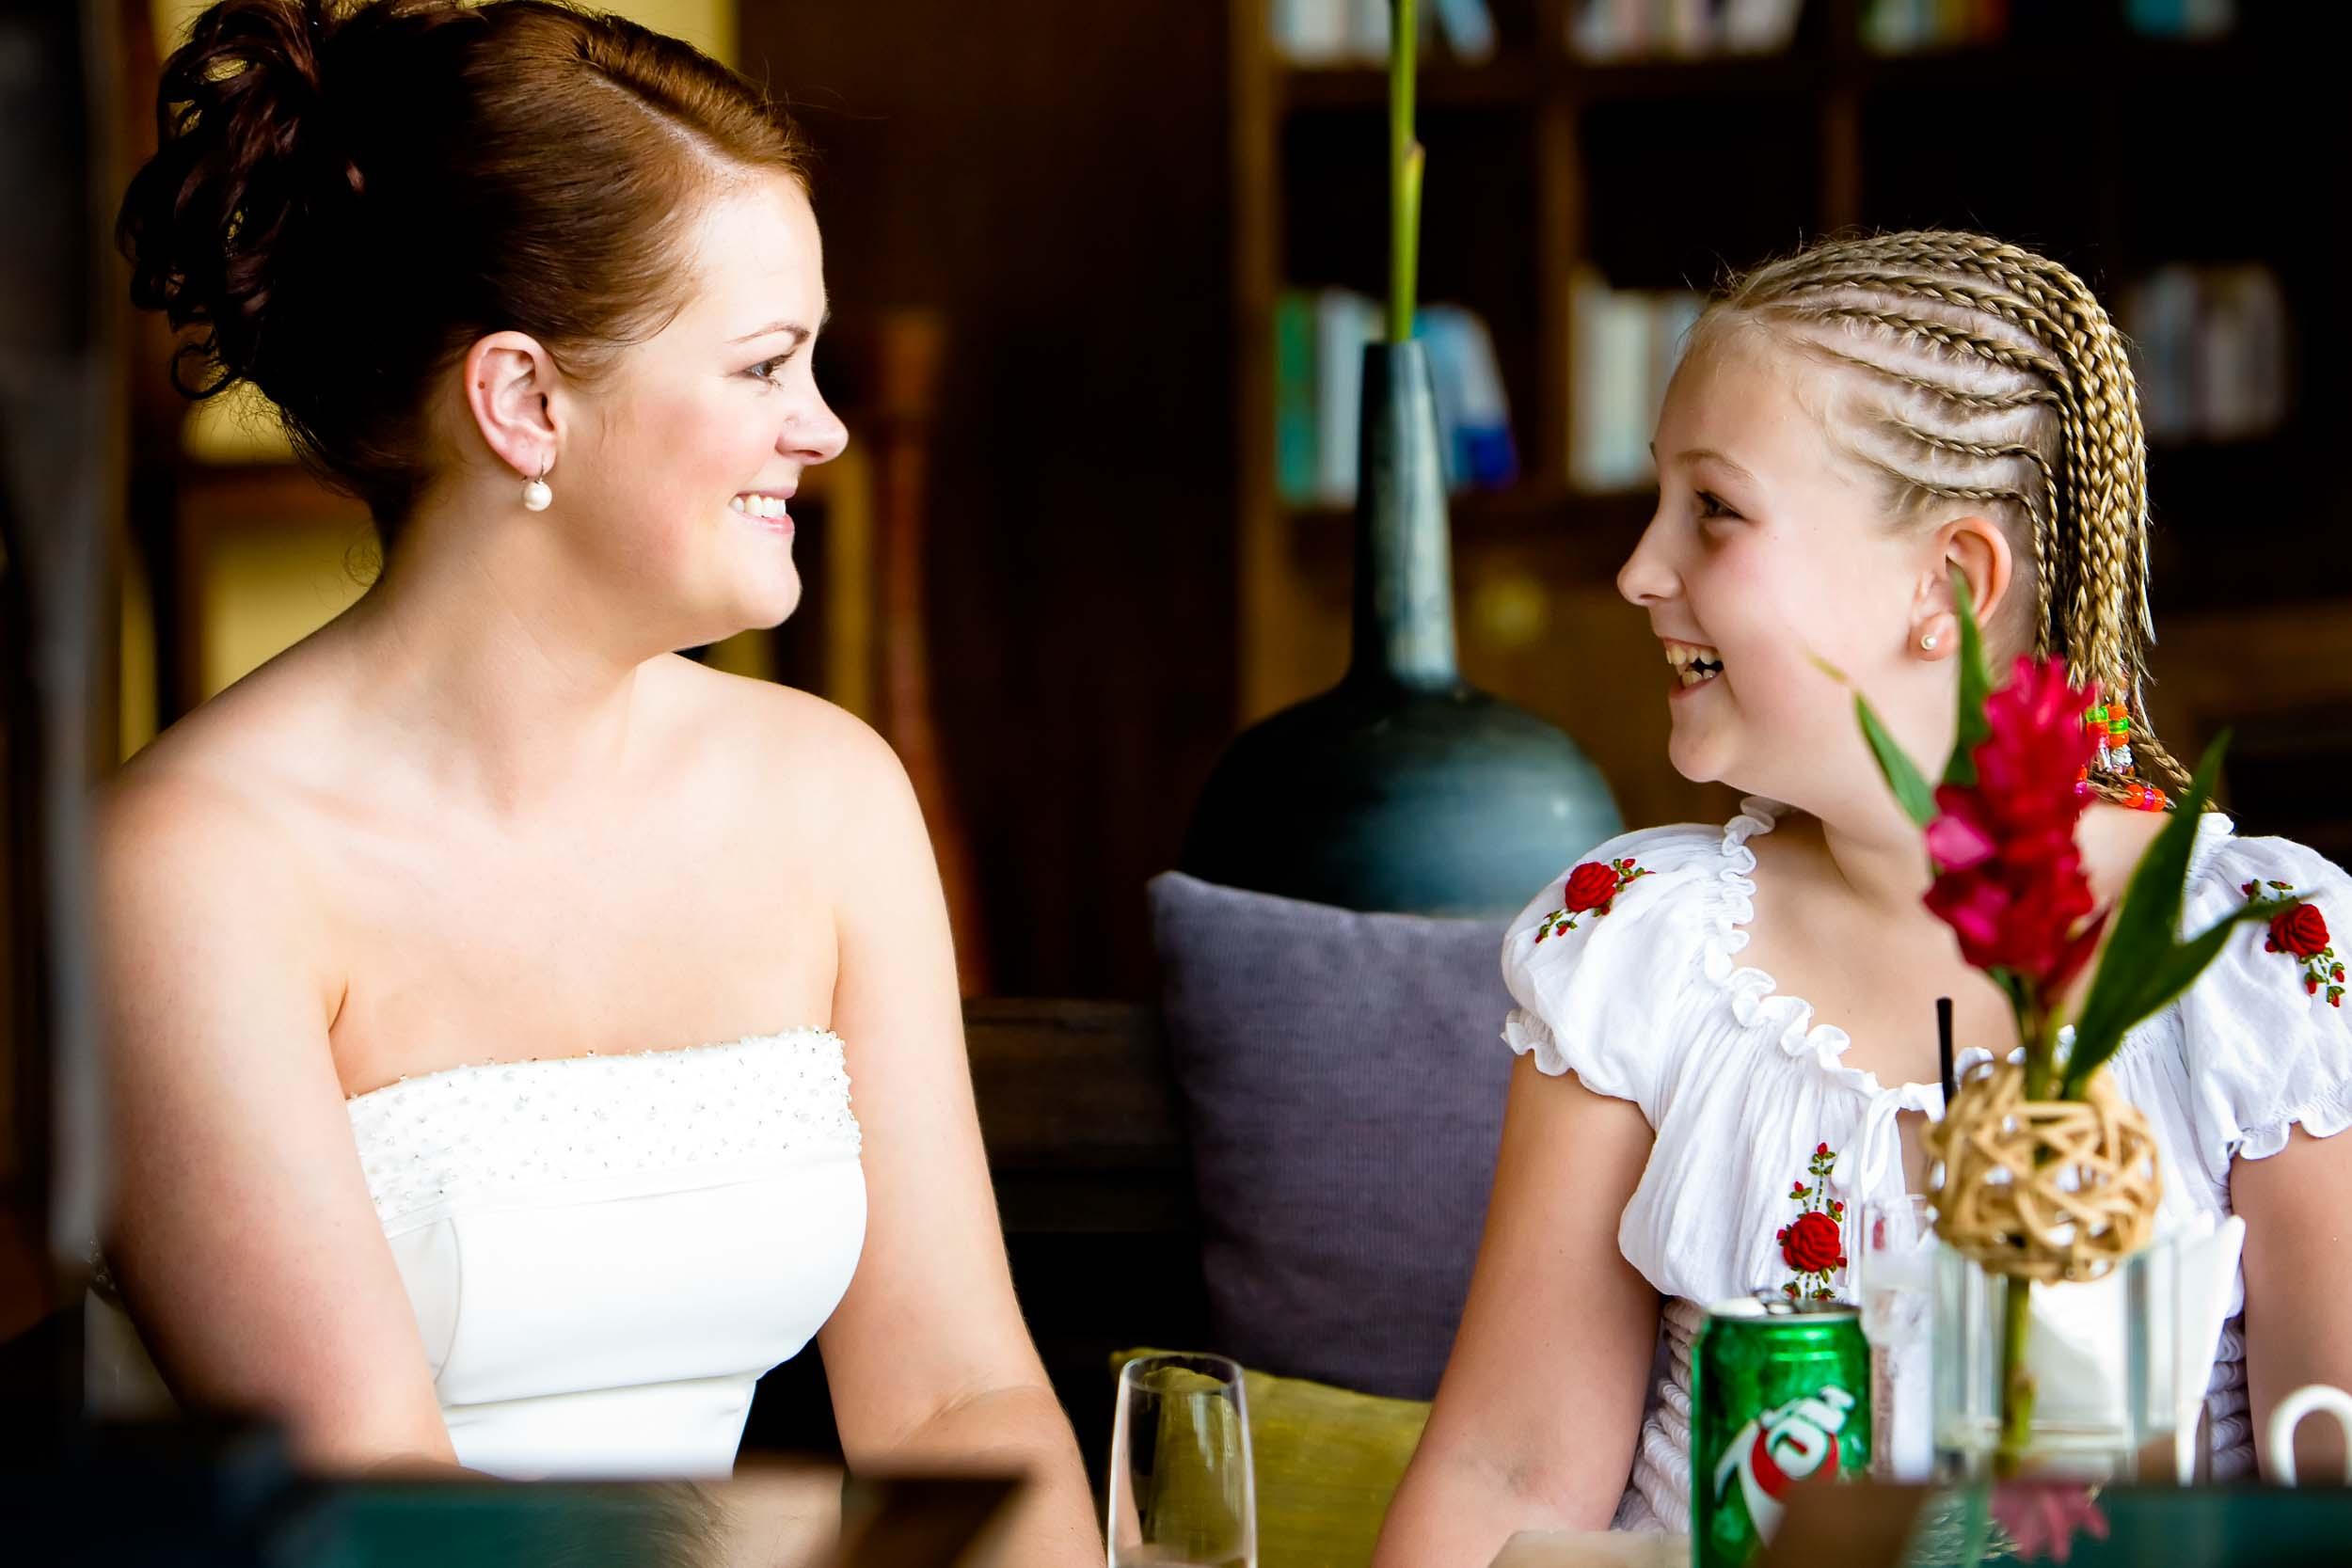 Thailand InterContinental Pattaya Resort Wedding Photography | NET-Photography Thailand Wedding Photographer